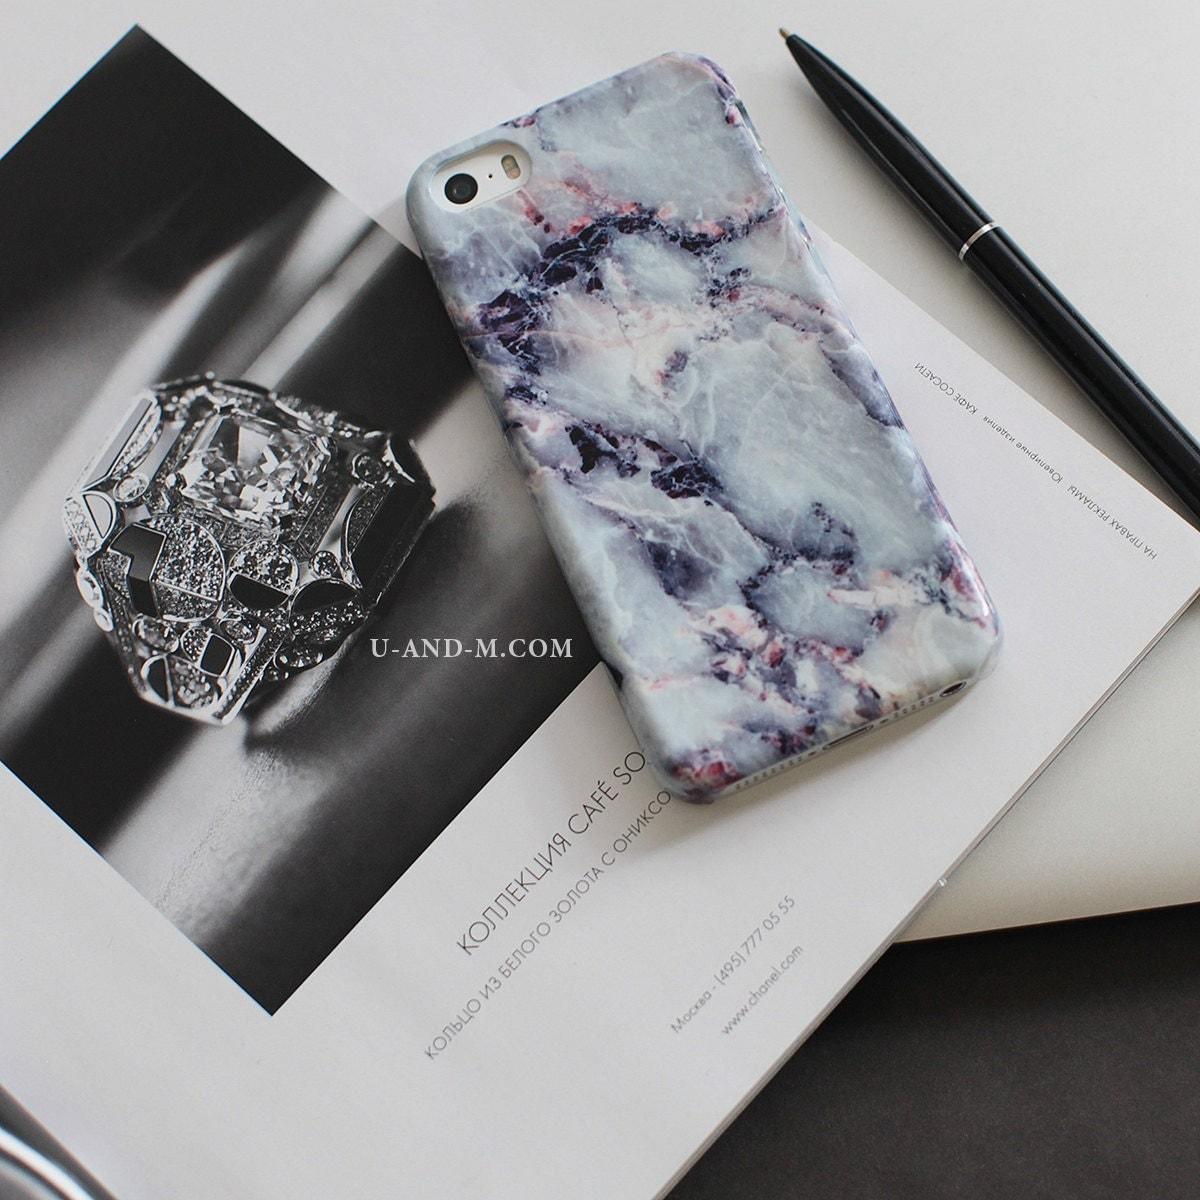 impression en marbre rose de coque iphone 6 cas iphone. Black Bedroom Furniture Sets. Home Design Ideas